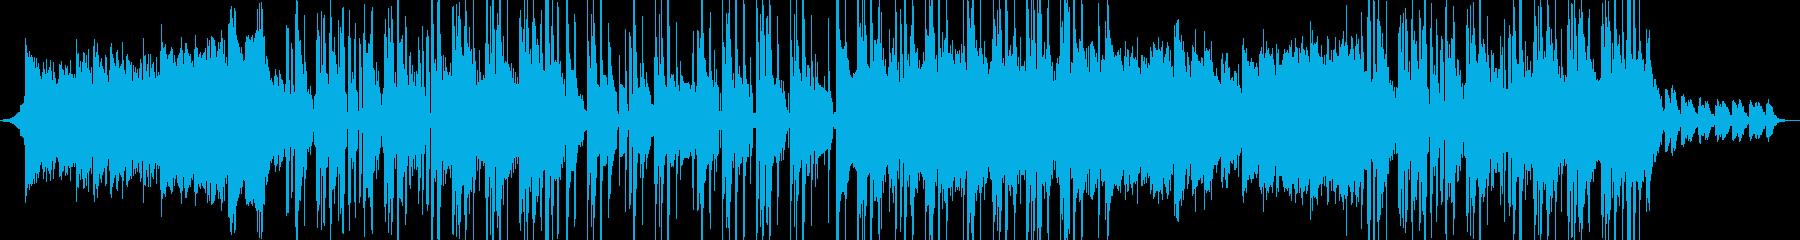 K-POP風のクールなポップスの再生済みの波形